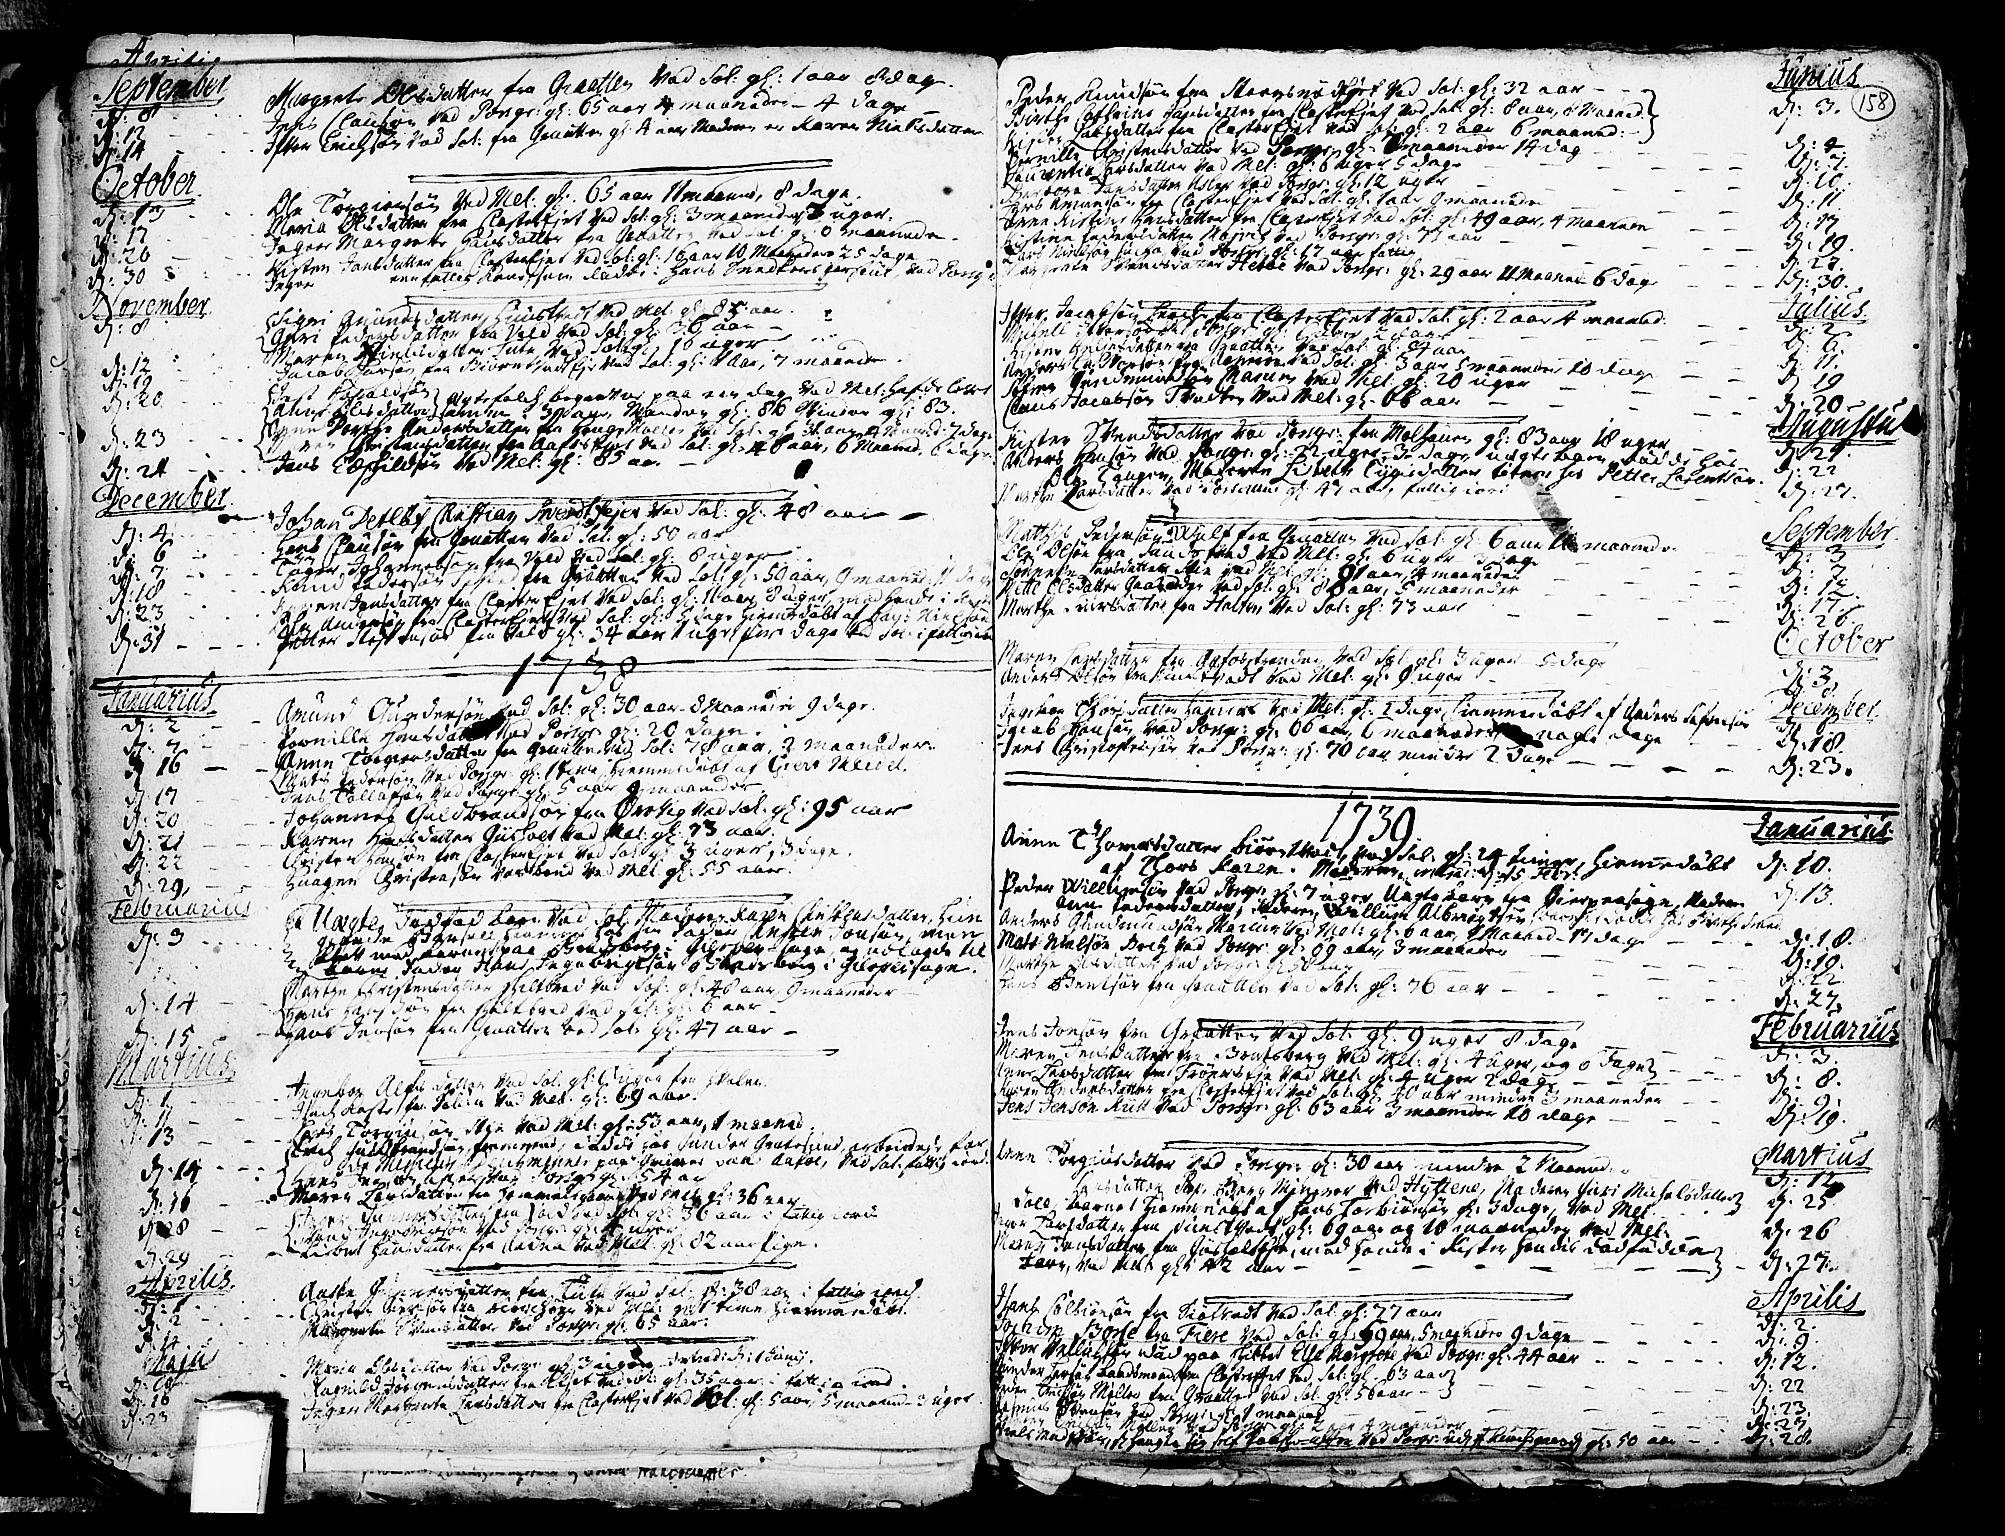 SAKO, Solum kirkebøker, F/Fa/L0002: Ministerialbok nr. I 2, 1713-1761, s. 158